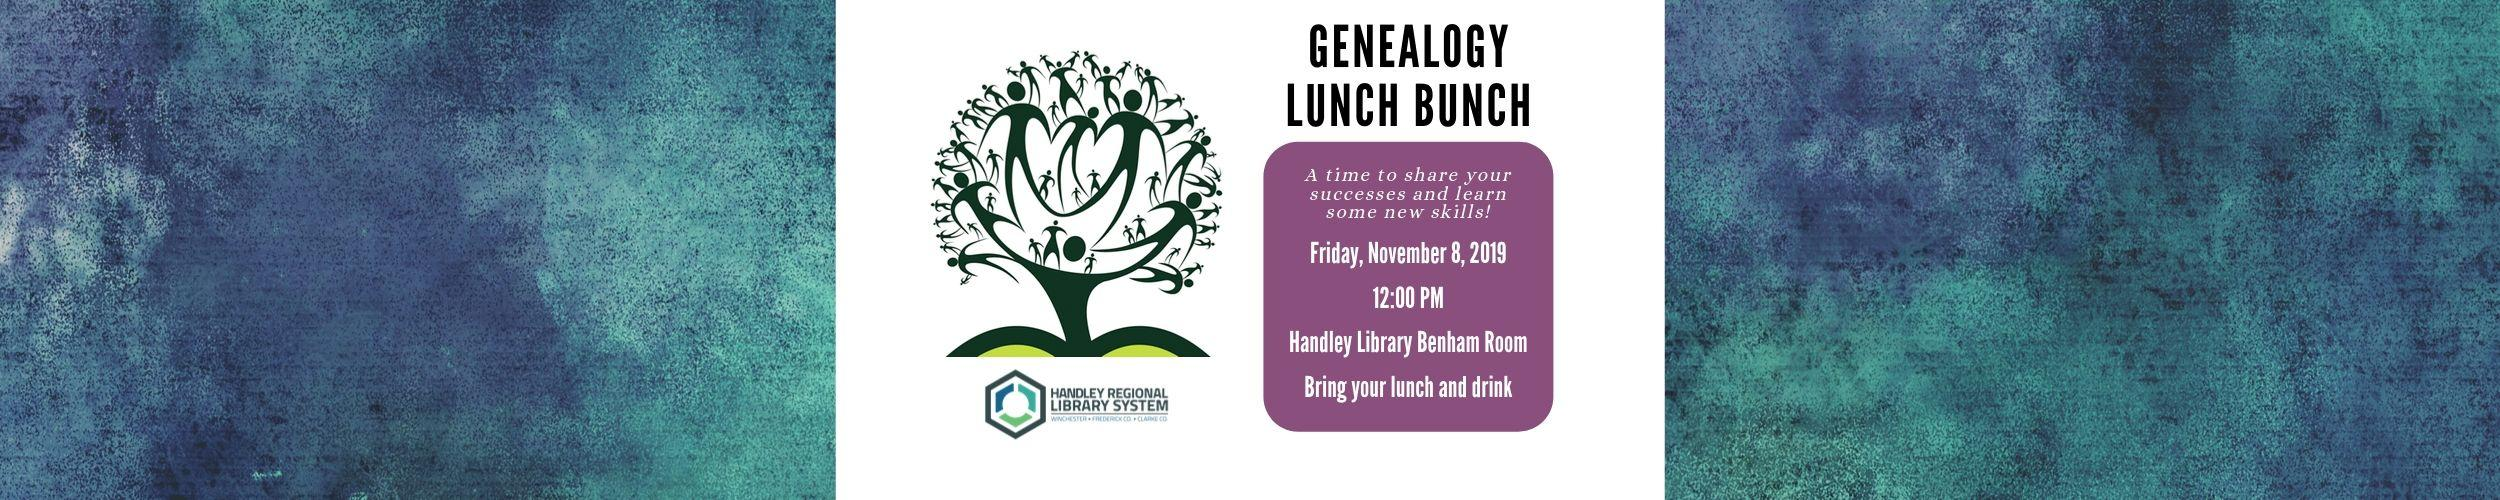 Genealogy Lunch Bunch